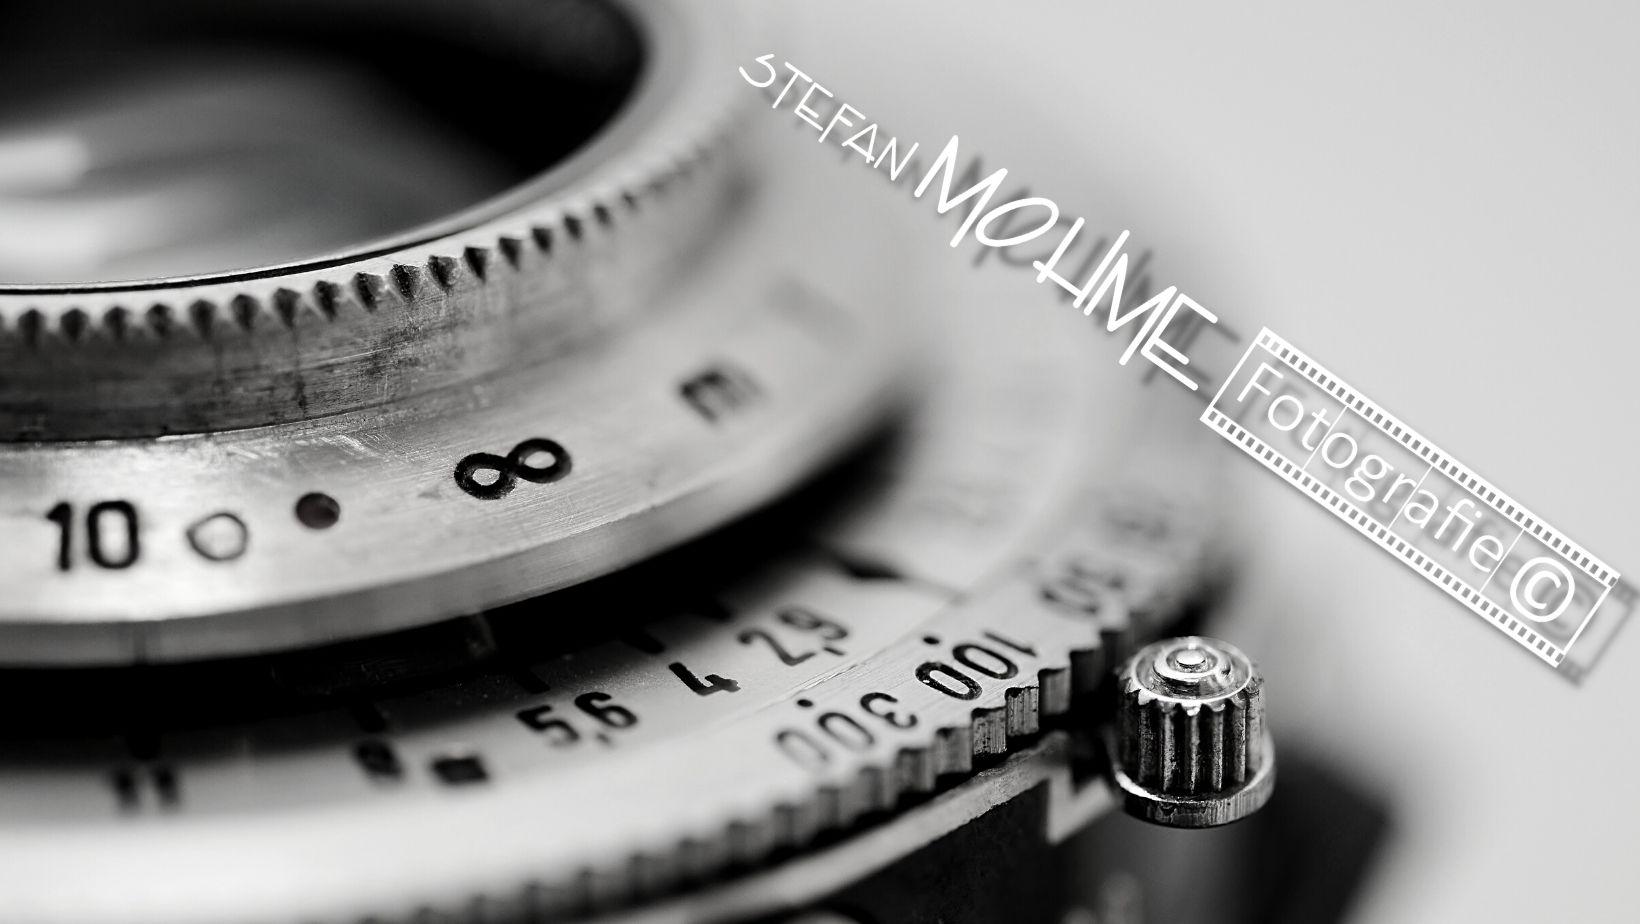 Objektiv alt, Logo Stefan Mohme